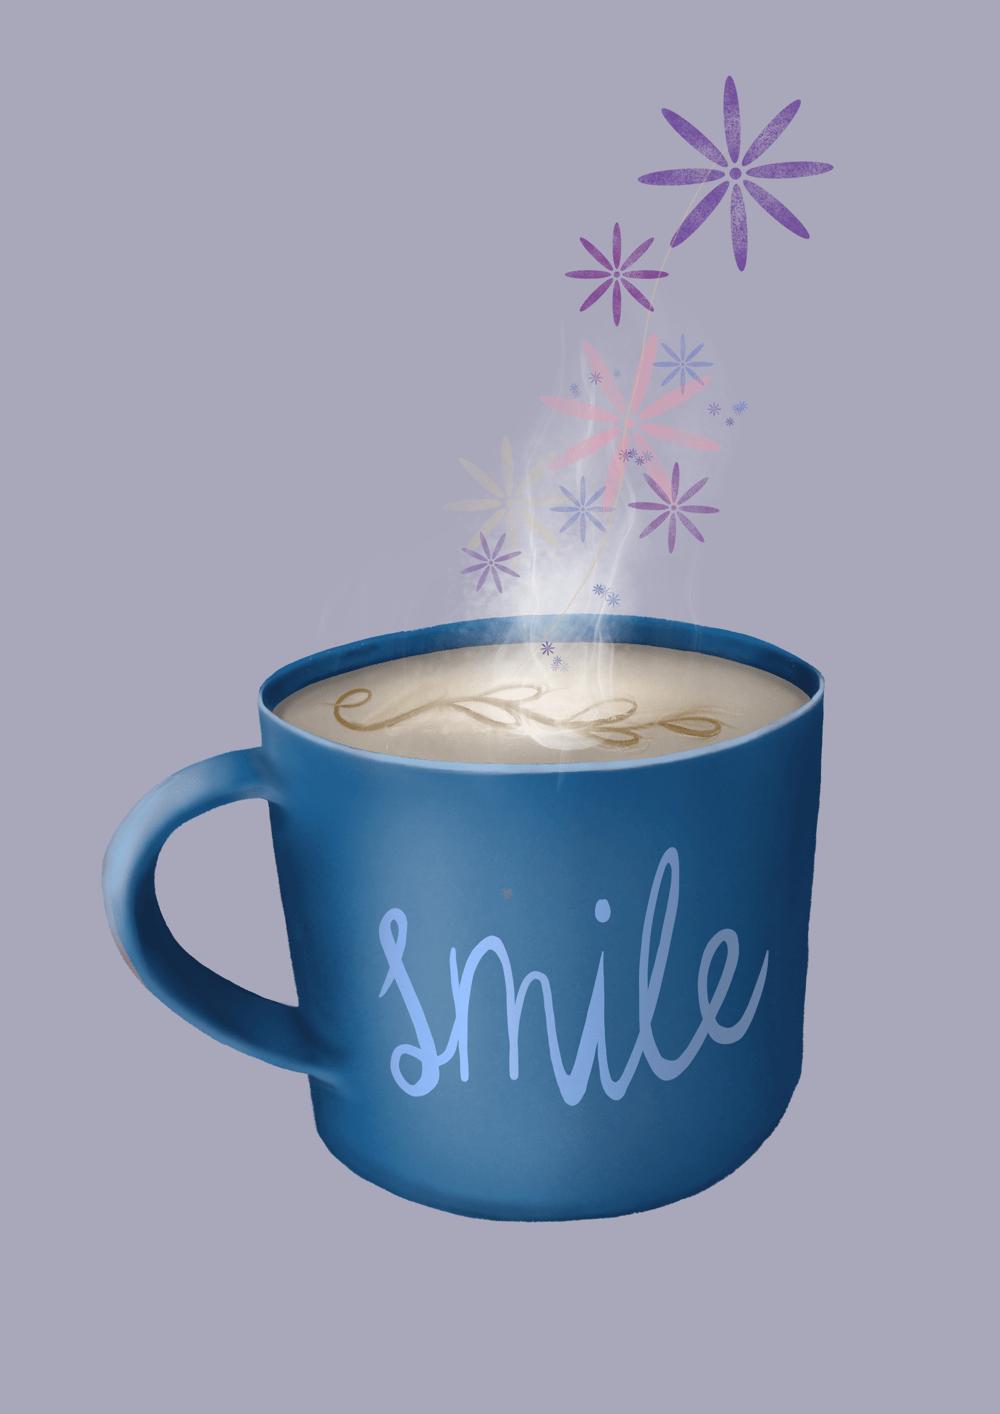 Motivational coffee mug - image 1 - student project